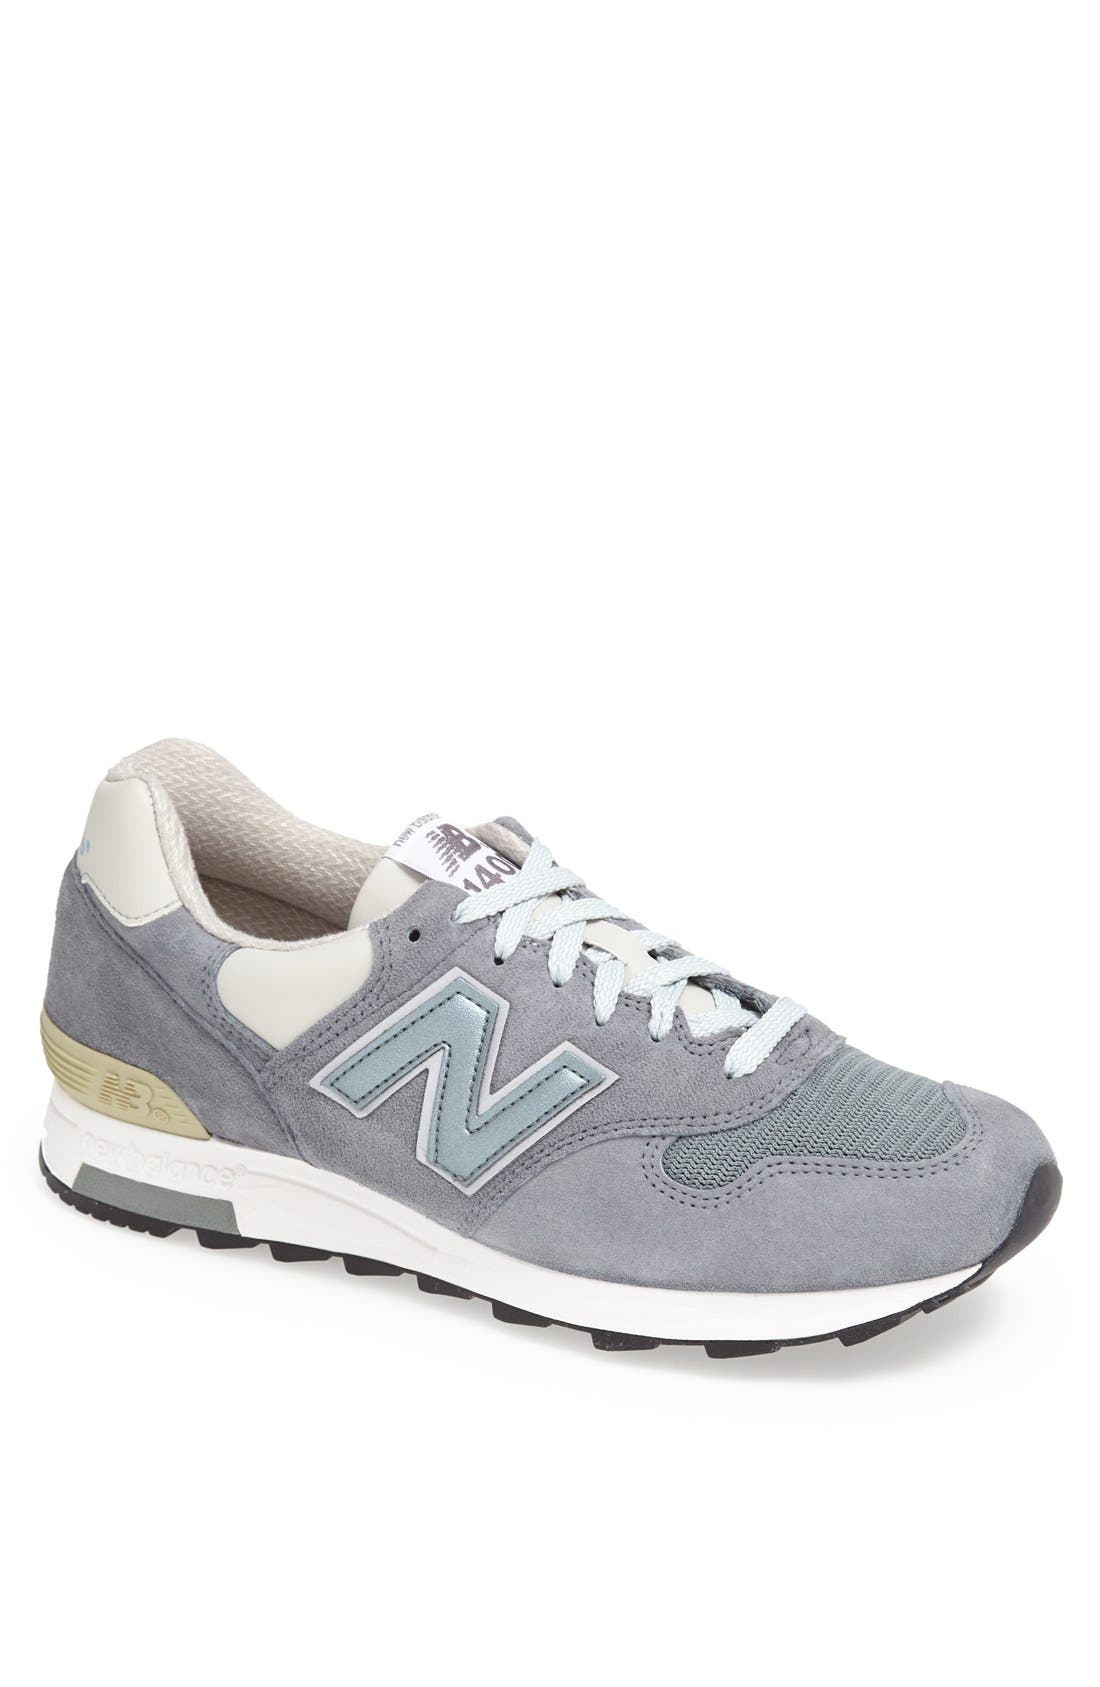 Alternate Image 1 Selected - New Balance '1400' Suede Running Shoe (Men)